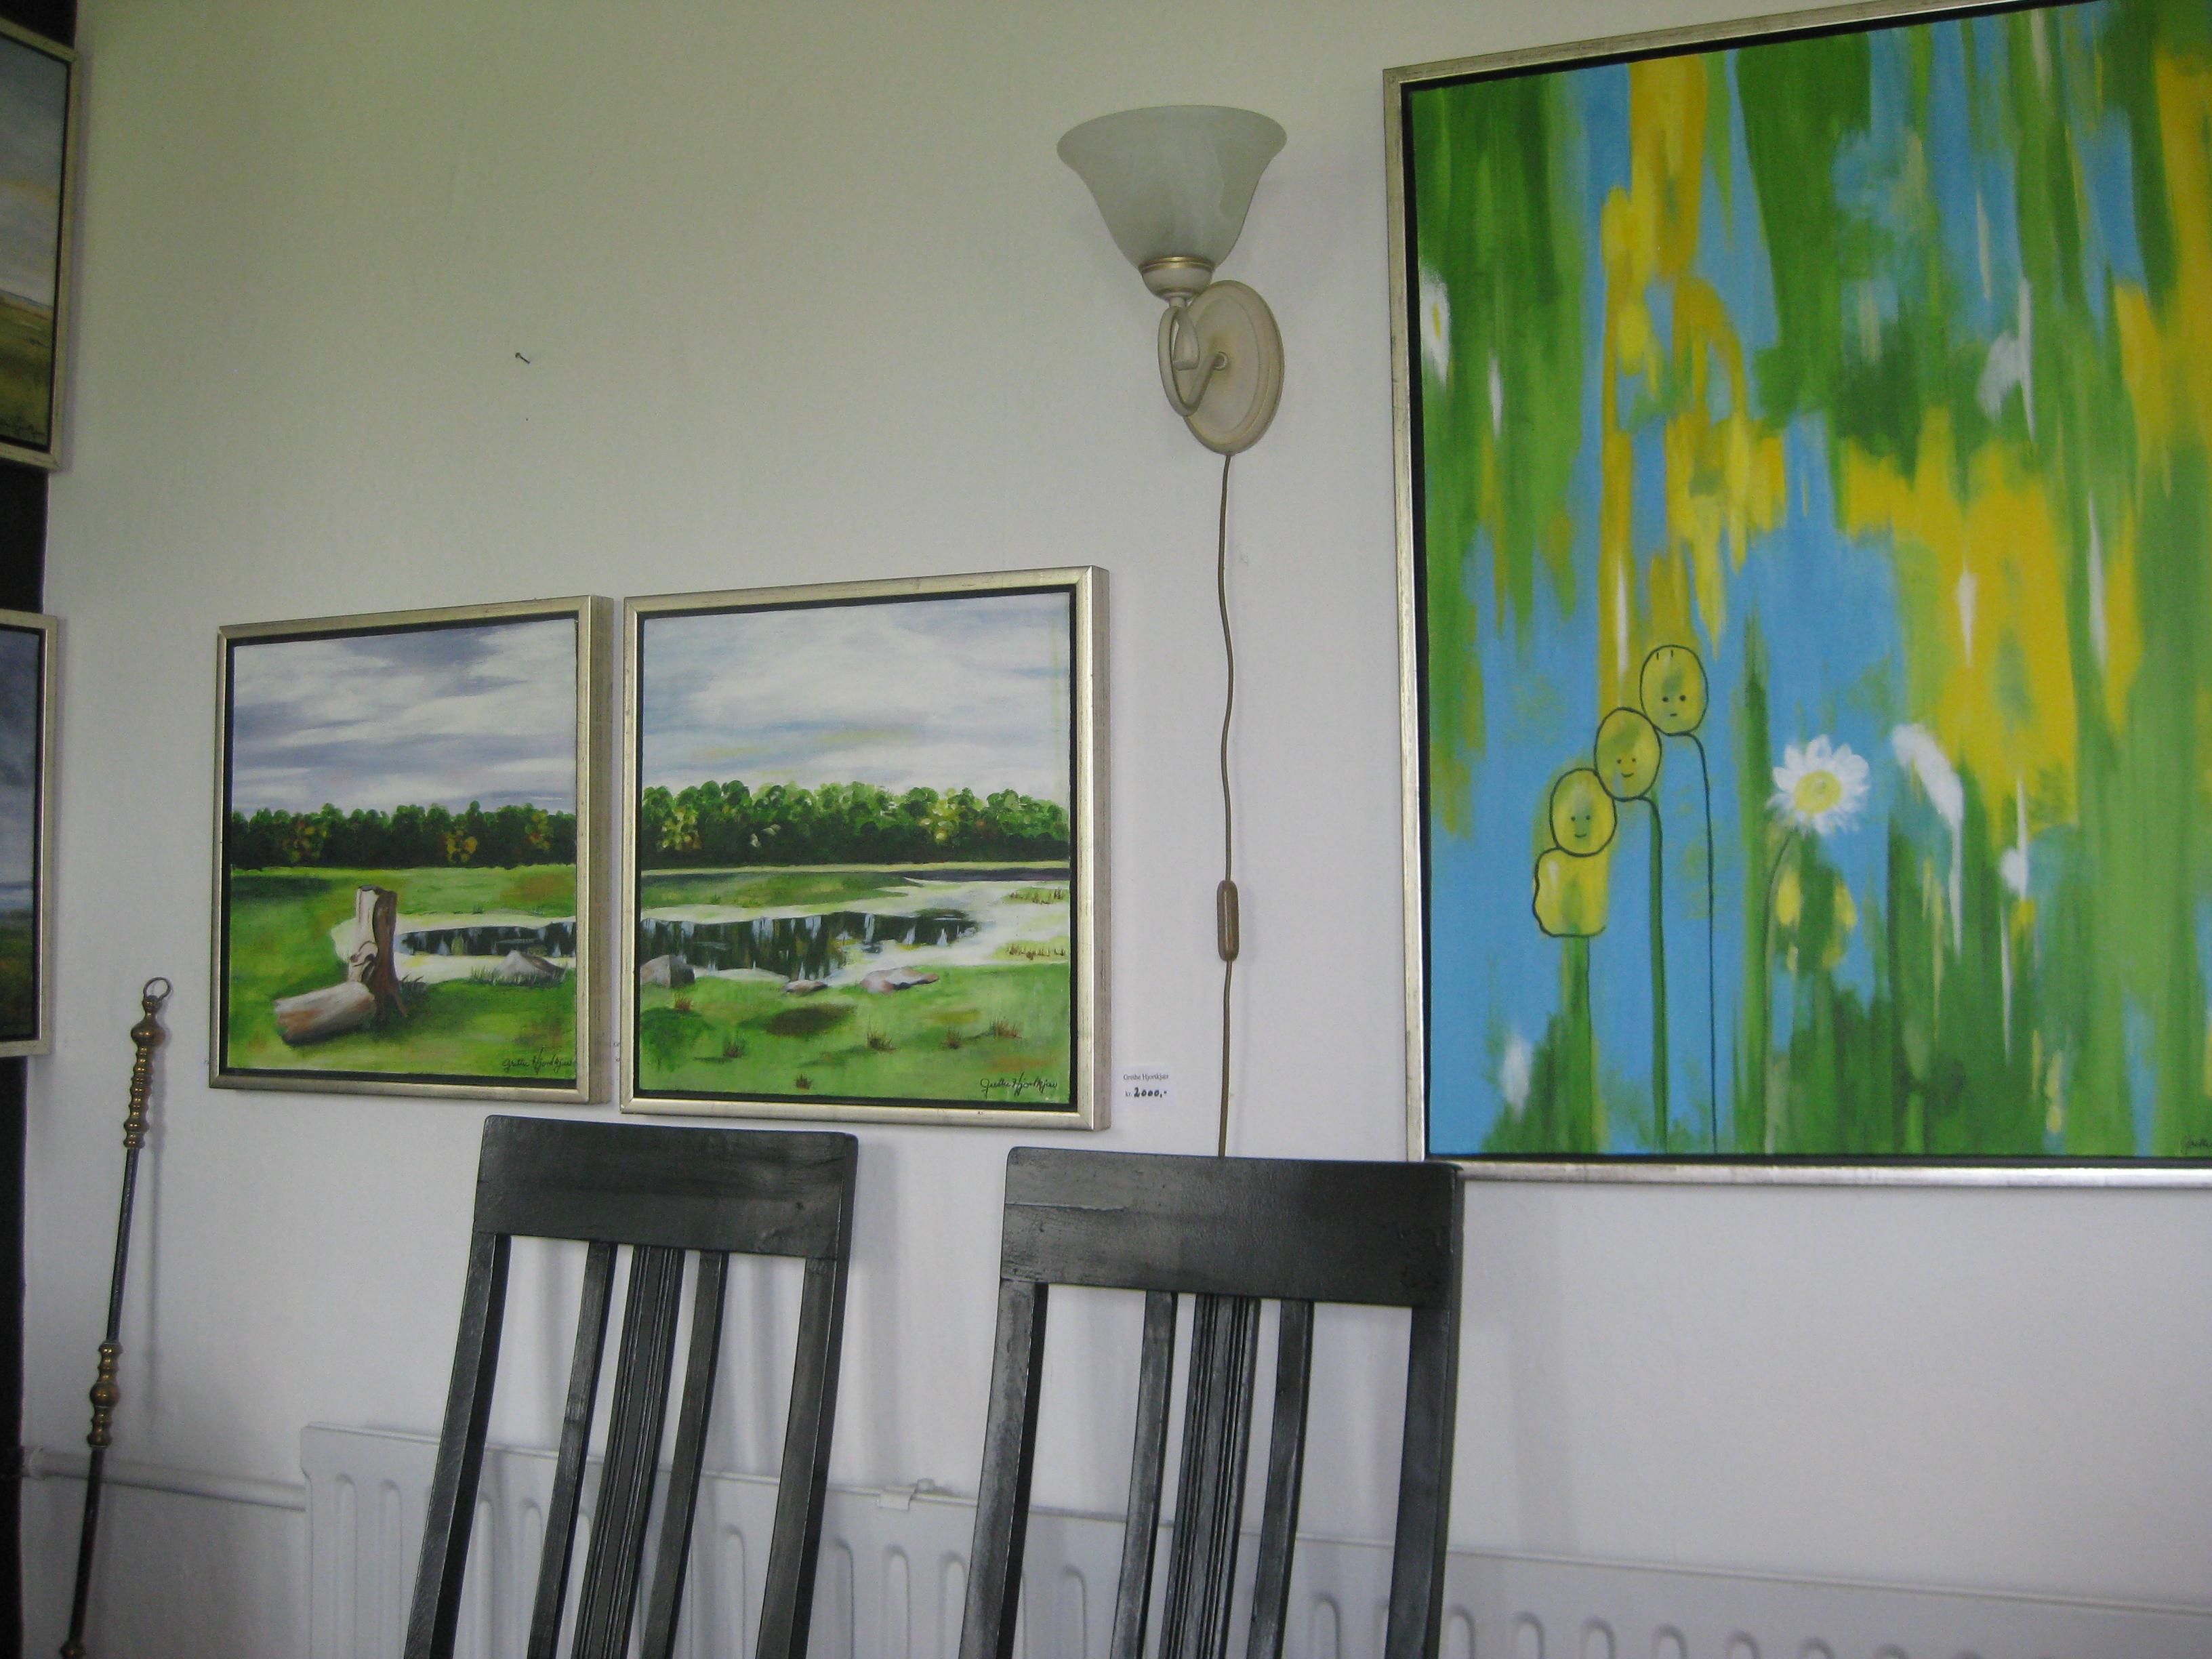 Grethe Hjortkjaer, Lemvig